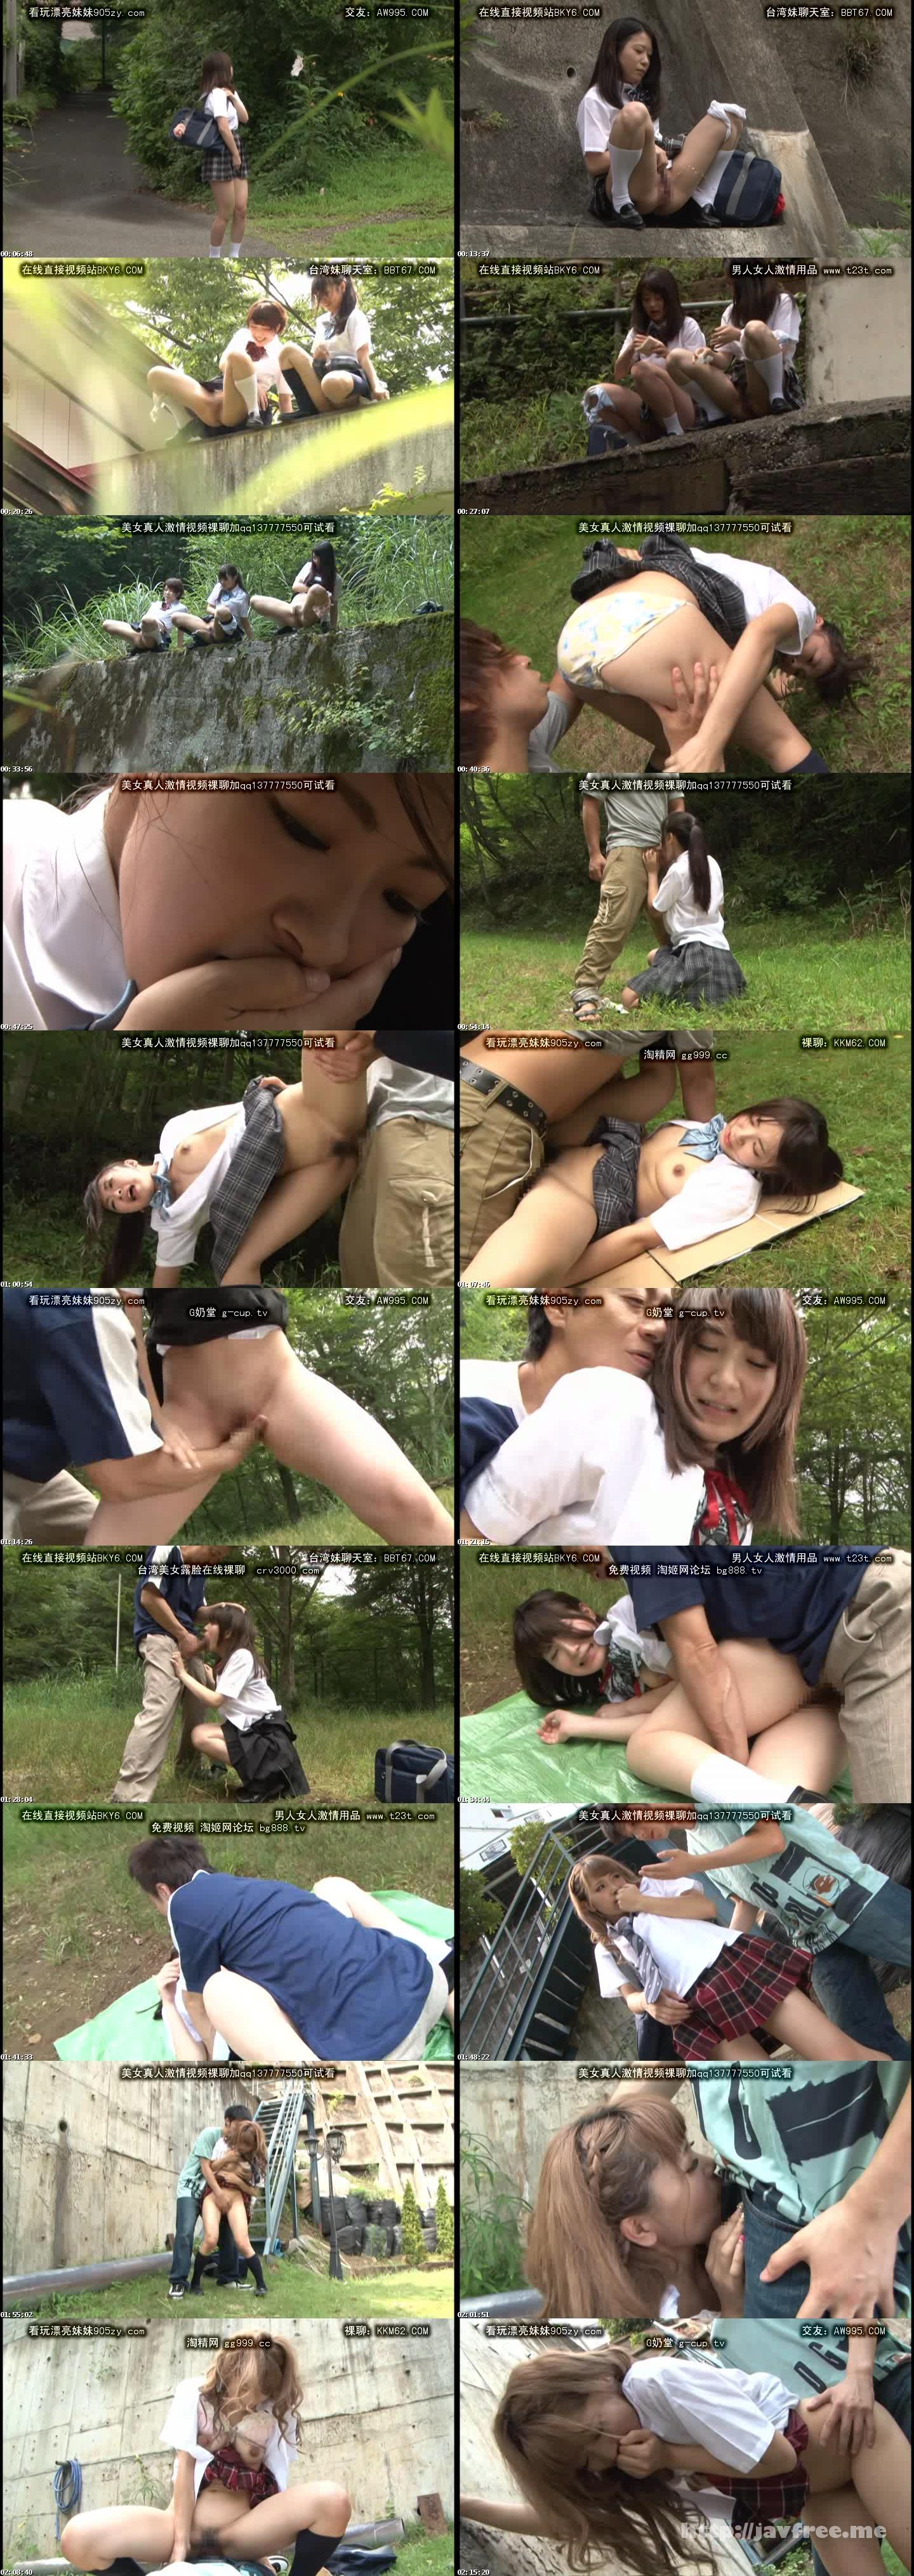 [FSET-581] 下校中に野ションする女子校生 - image FSET-581 on https://javfree.me